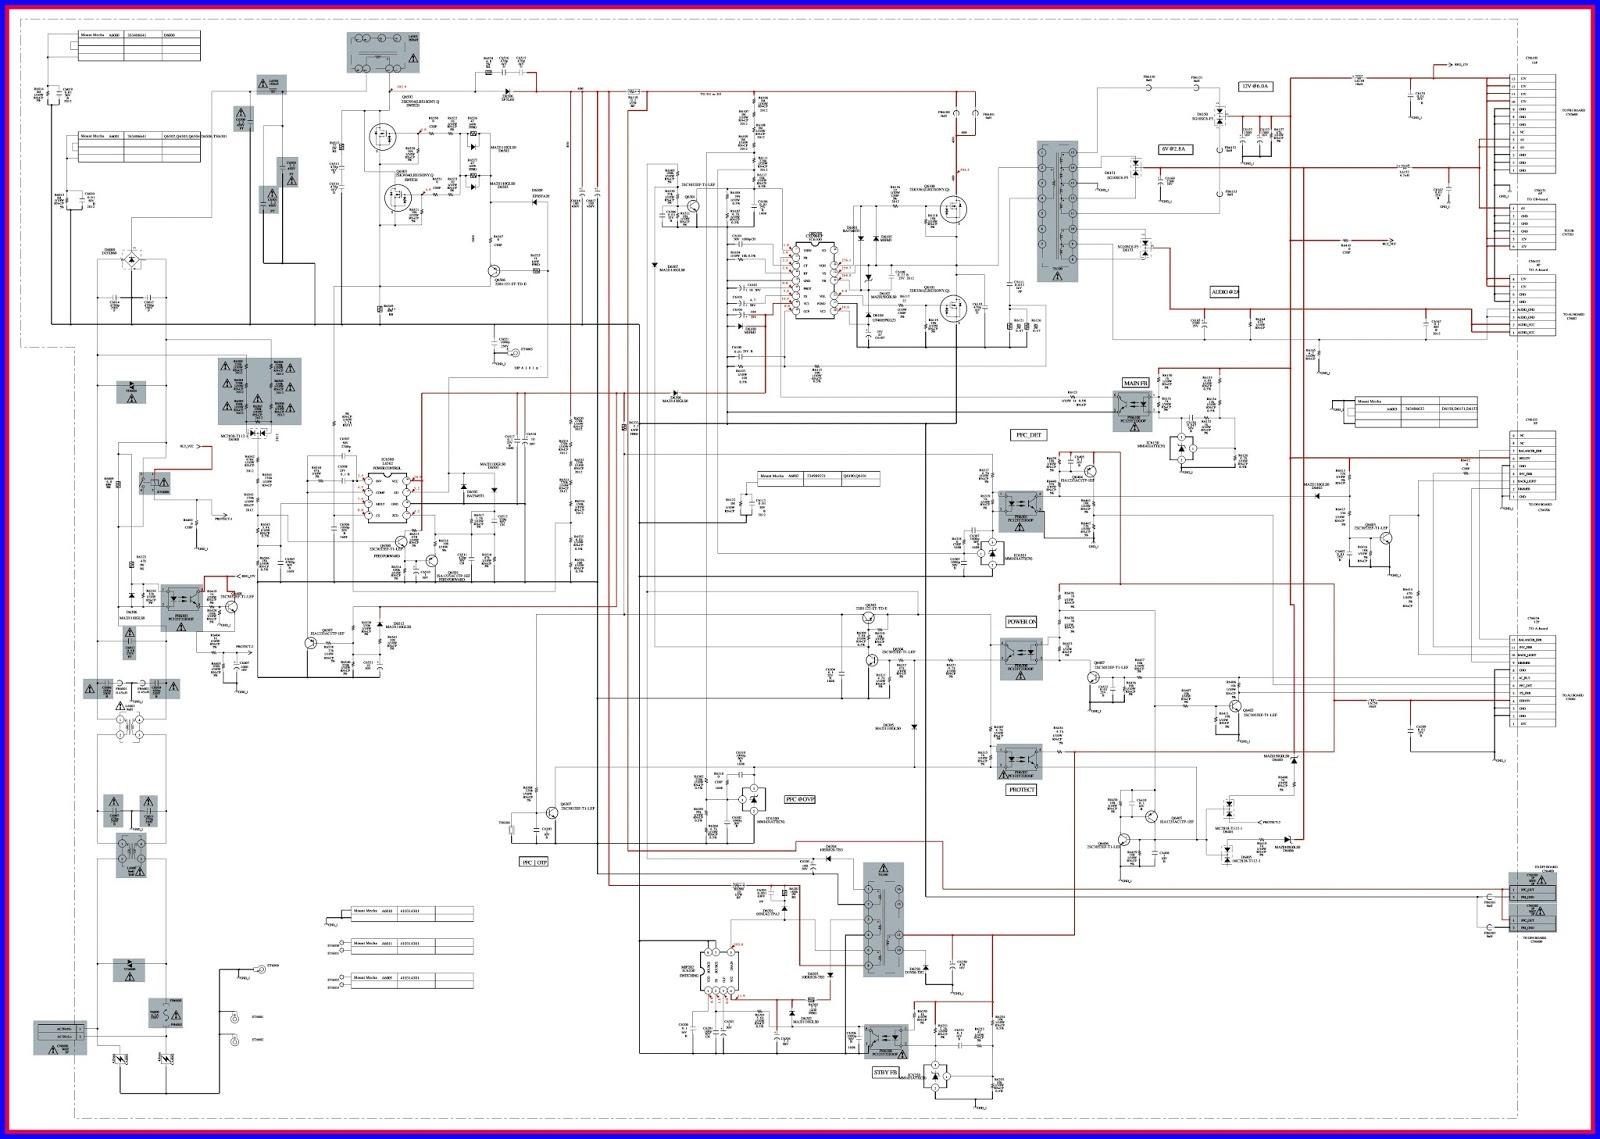 ELECTRONIC EQUIPMENT REPAIR CENTRE : SONY KDL-40VL130